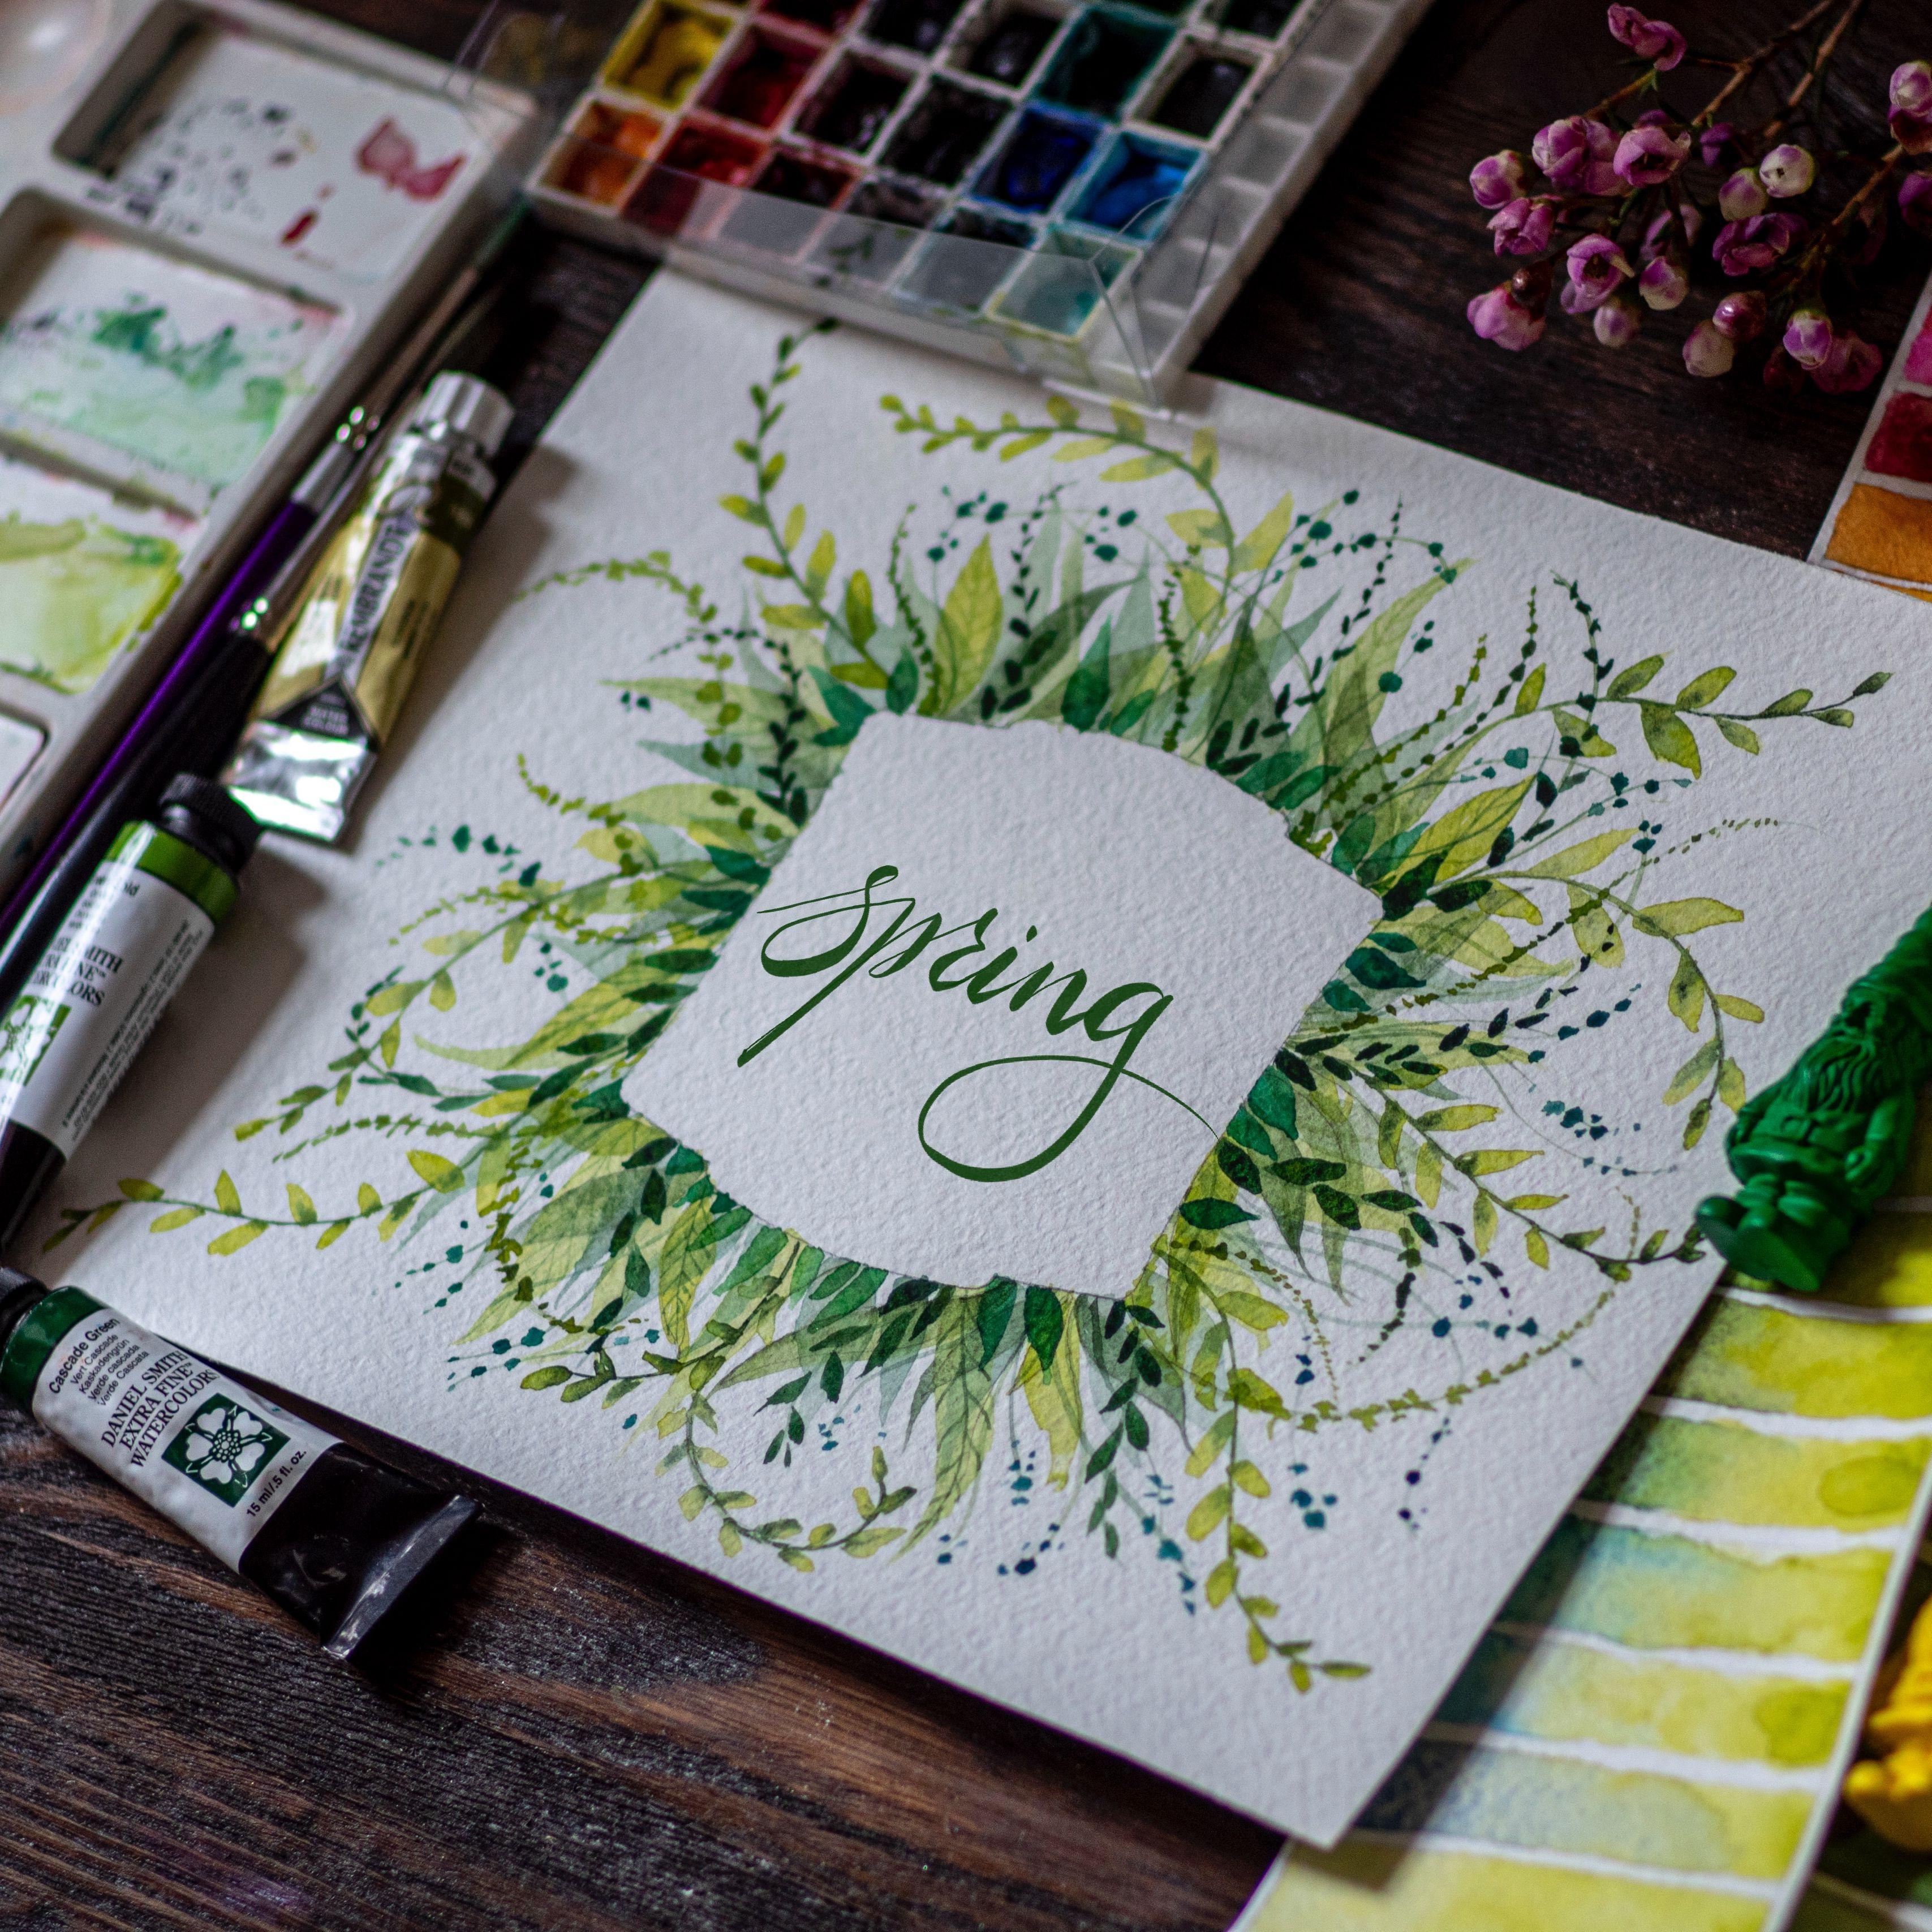 3415x3415 Обои весна, слово, леттеринг, краски, акварель